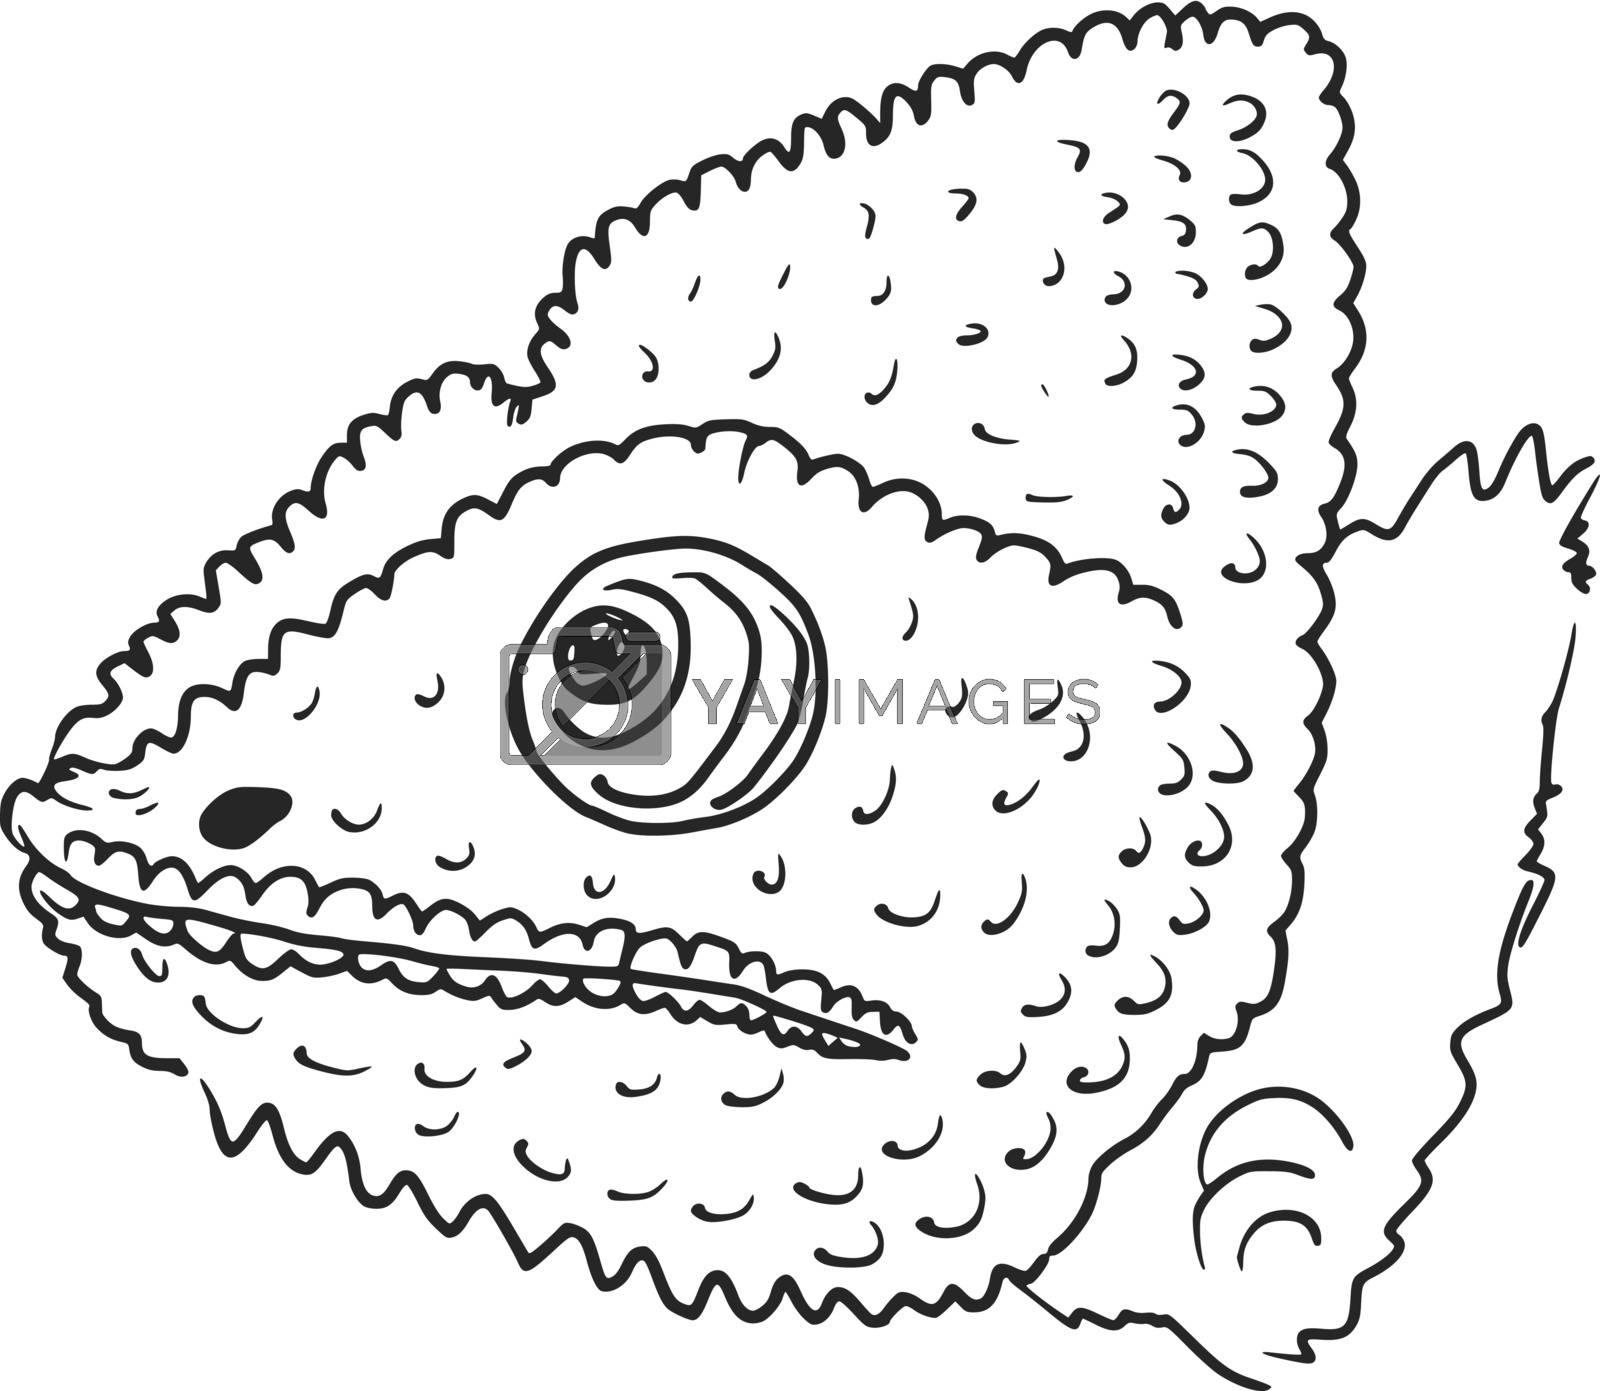 hand drawn, sketch, cartoon illustration of chameleon